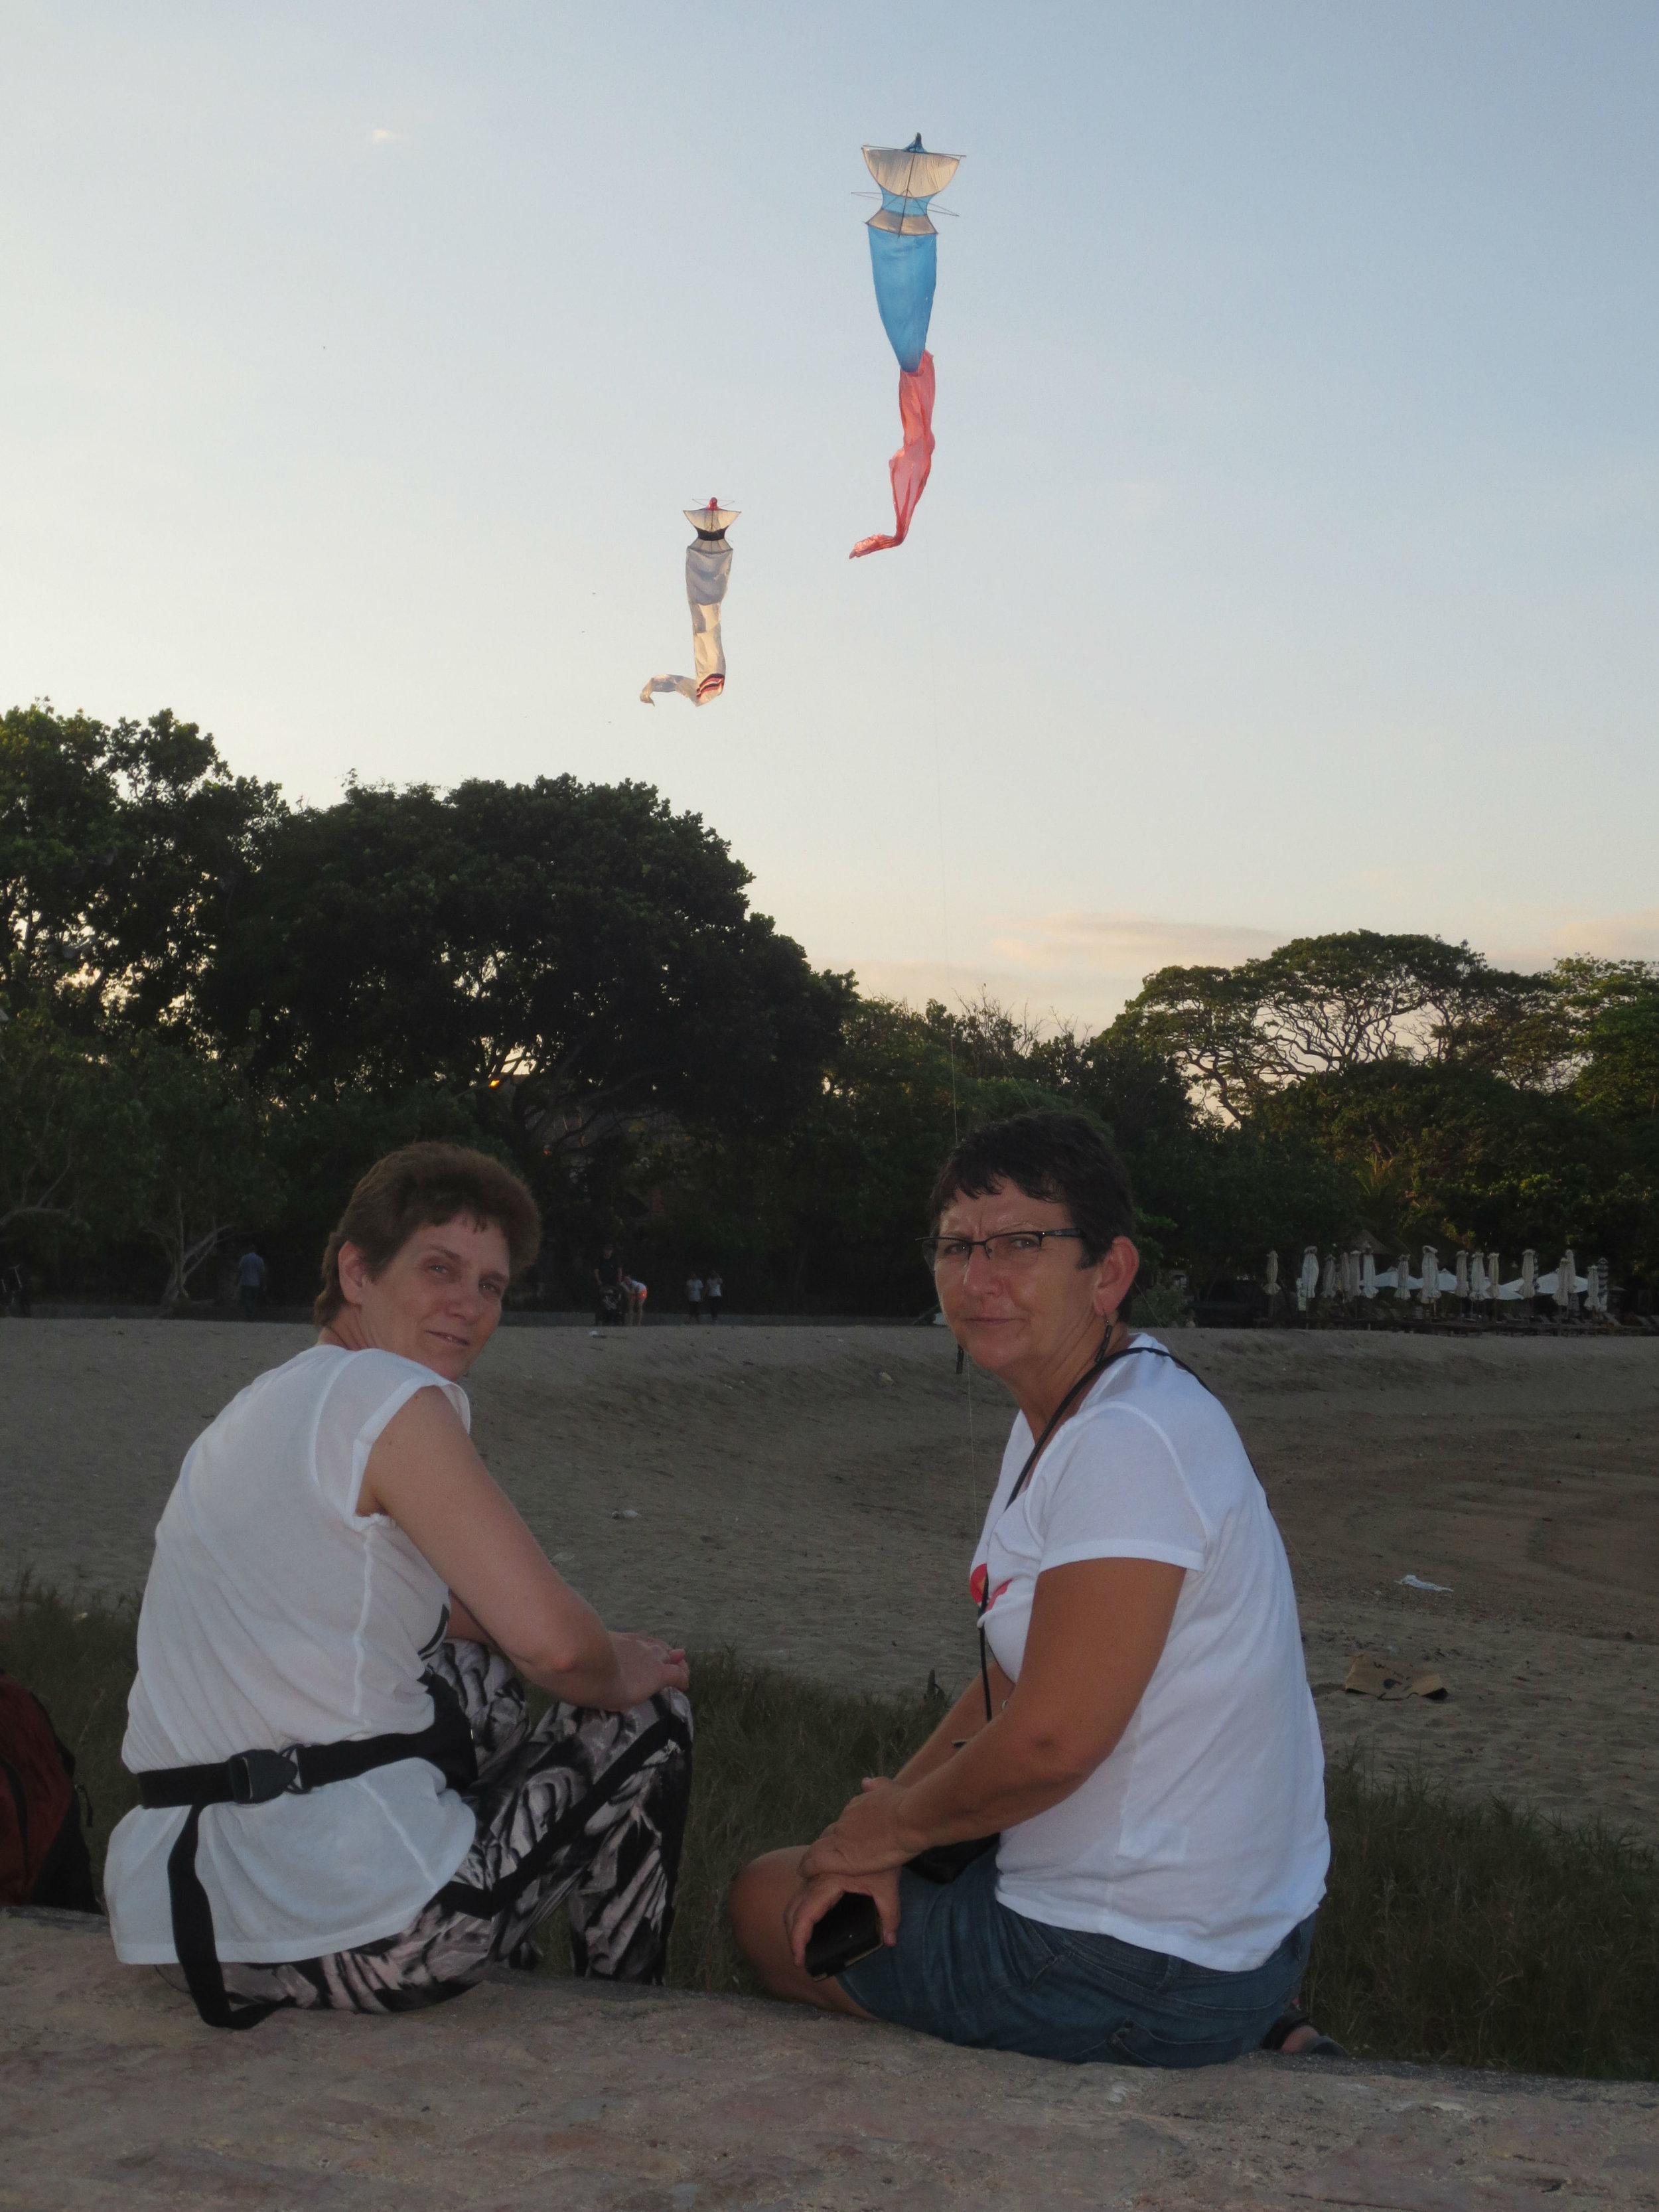 Kite flying on the beach